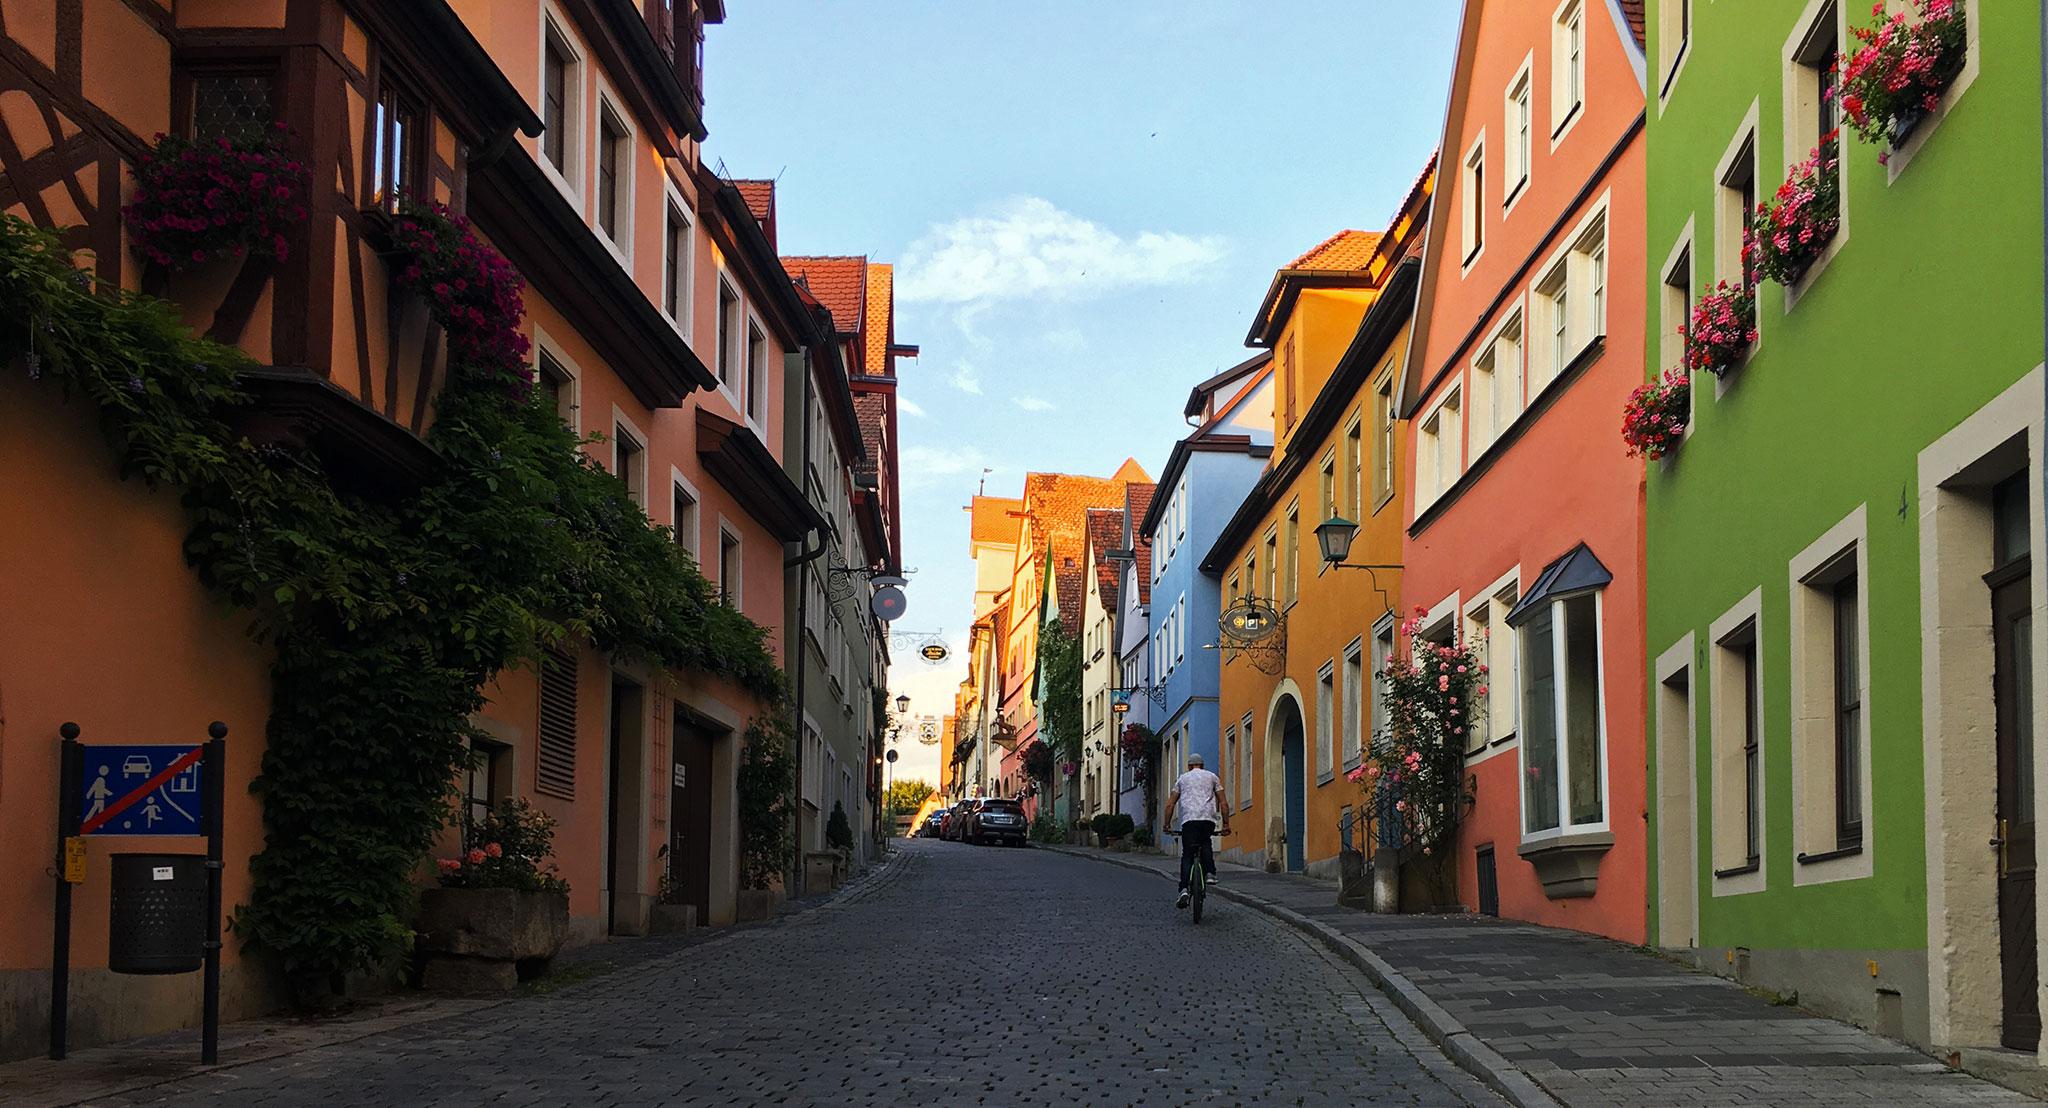 Rothenburg cobblestone street